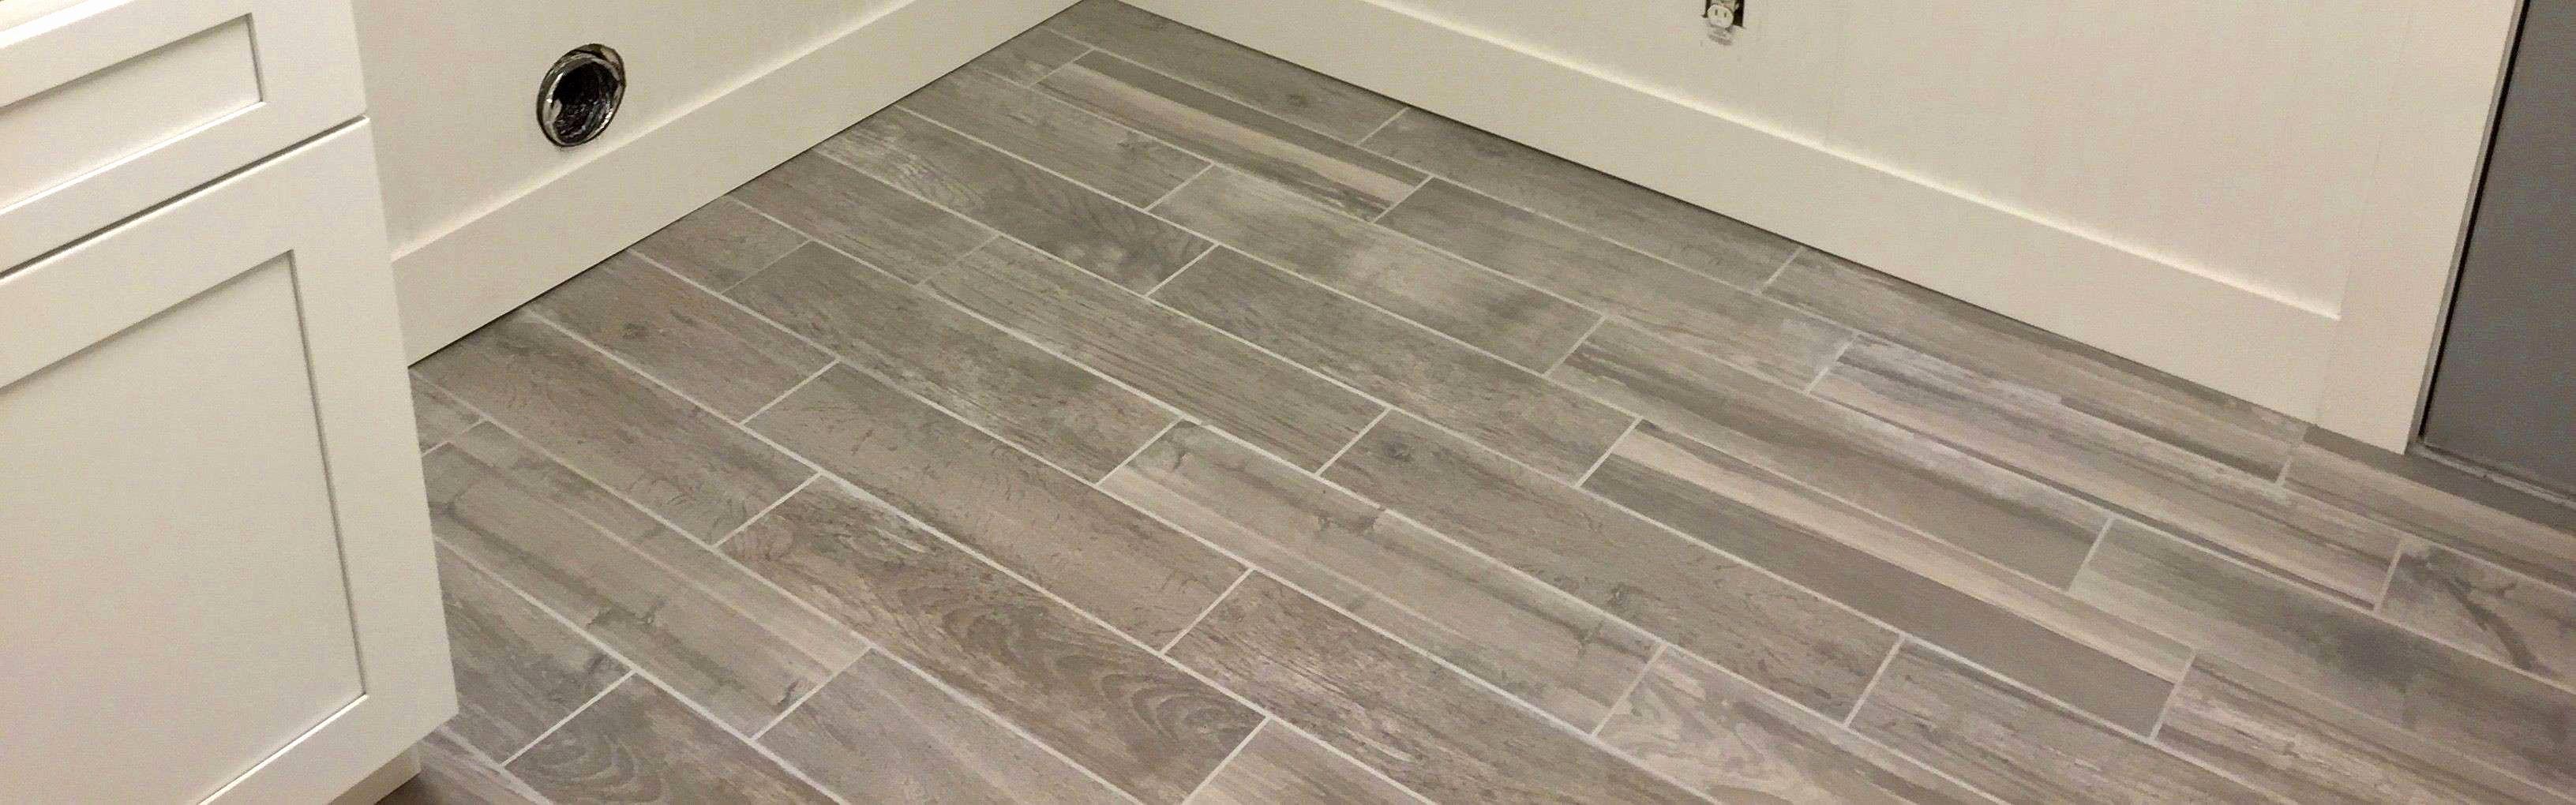 hardwood flooring blog of hardwood floor installation floor plan ideas within 20 photos of the hardwood floor installation